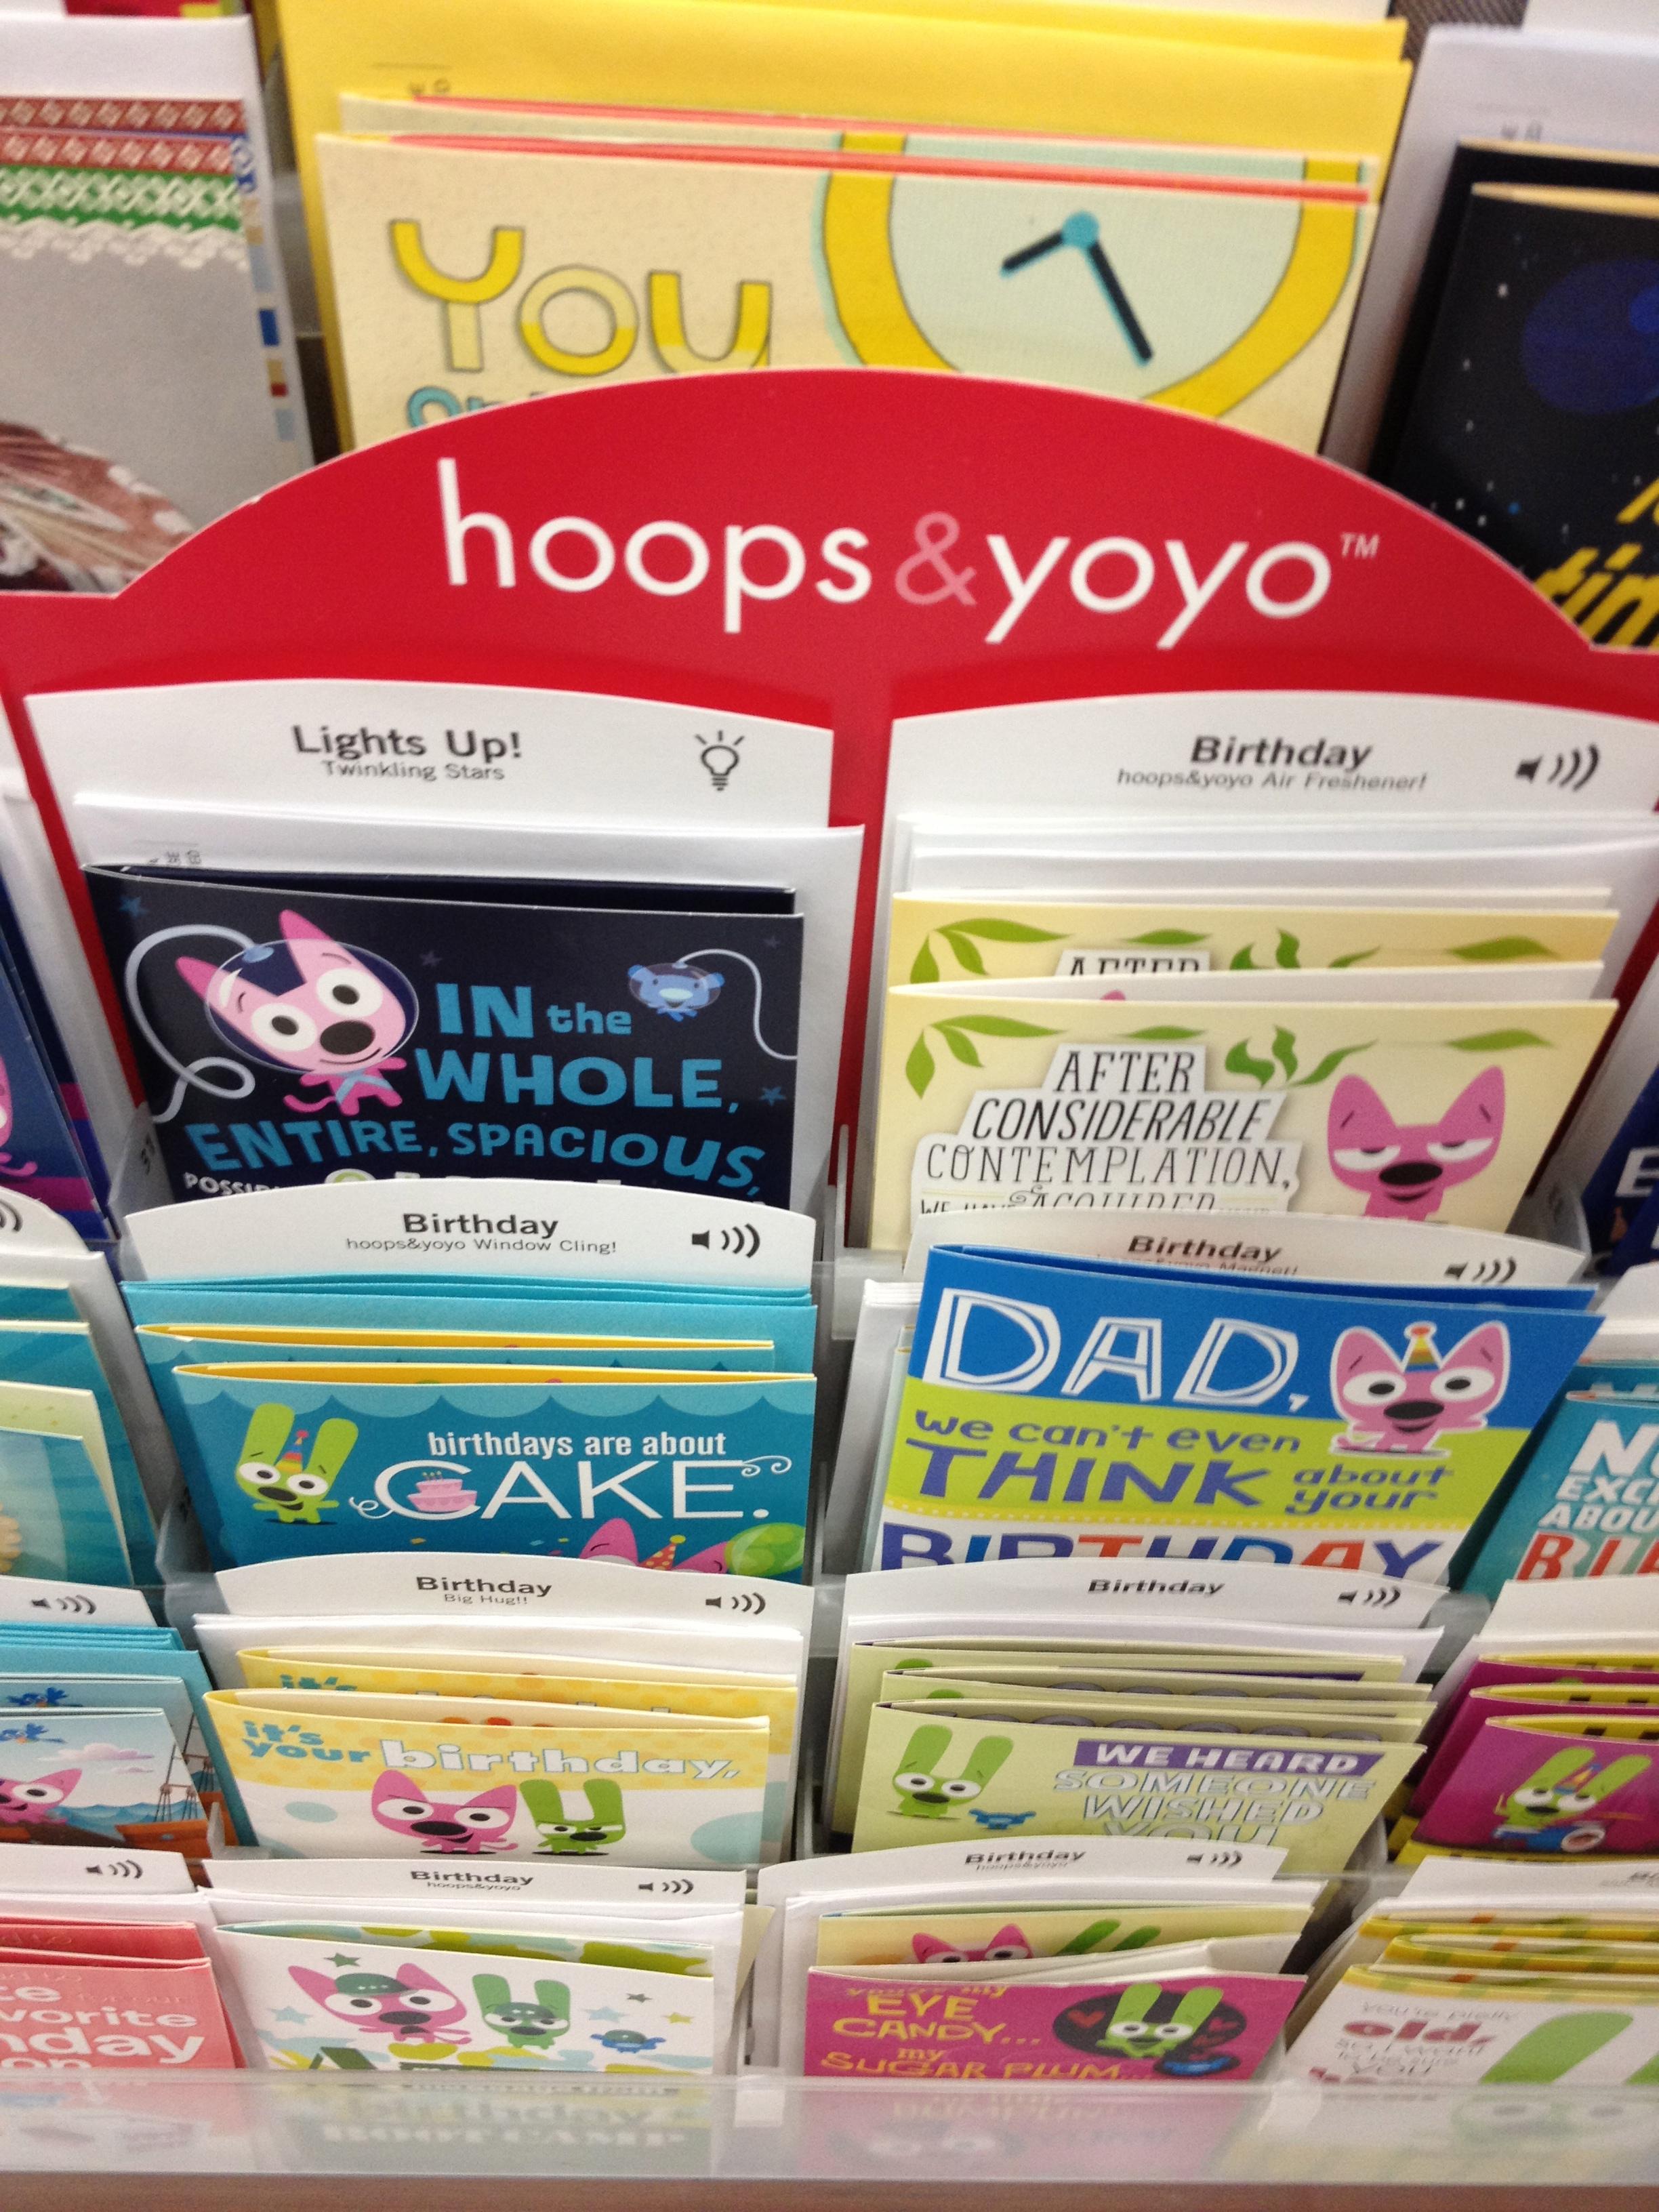 Yoyo Birthday Cards birthday card maker for kids greeting card – Hoops and Yoyo Birthday Card